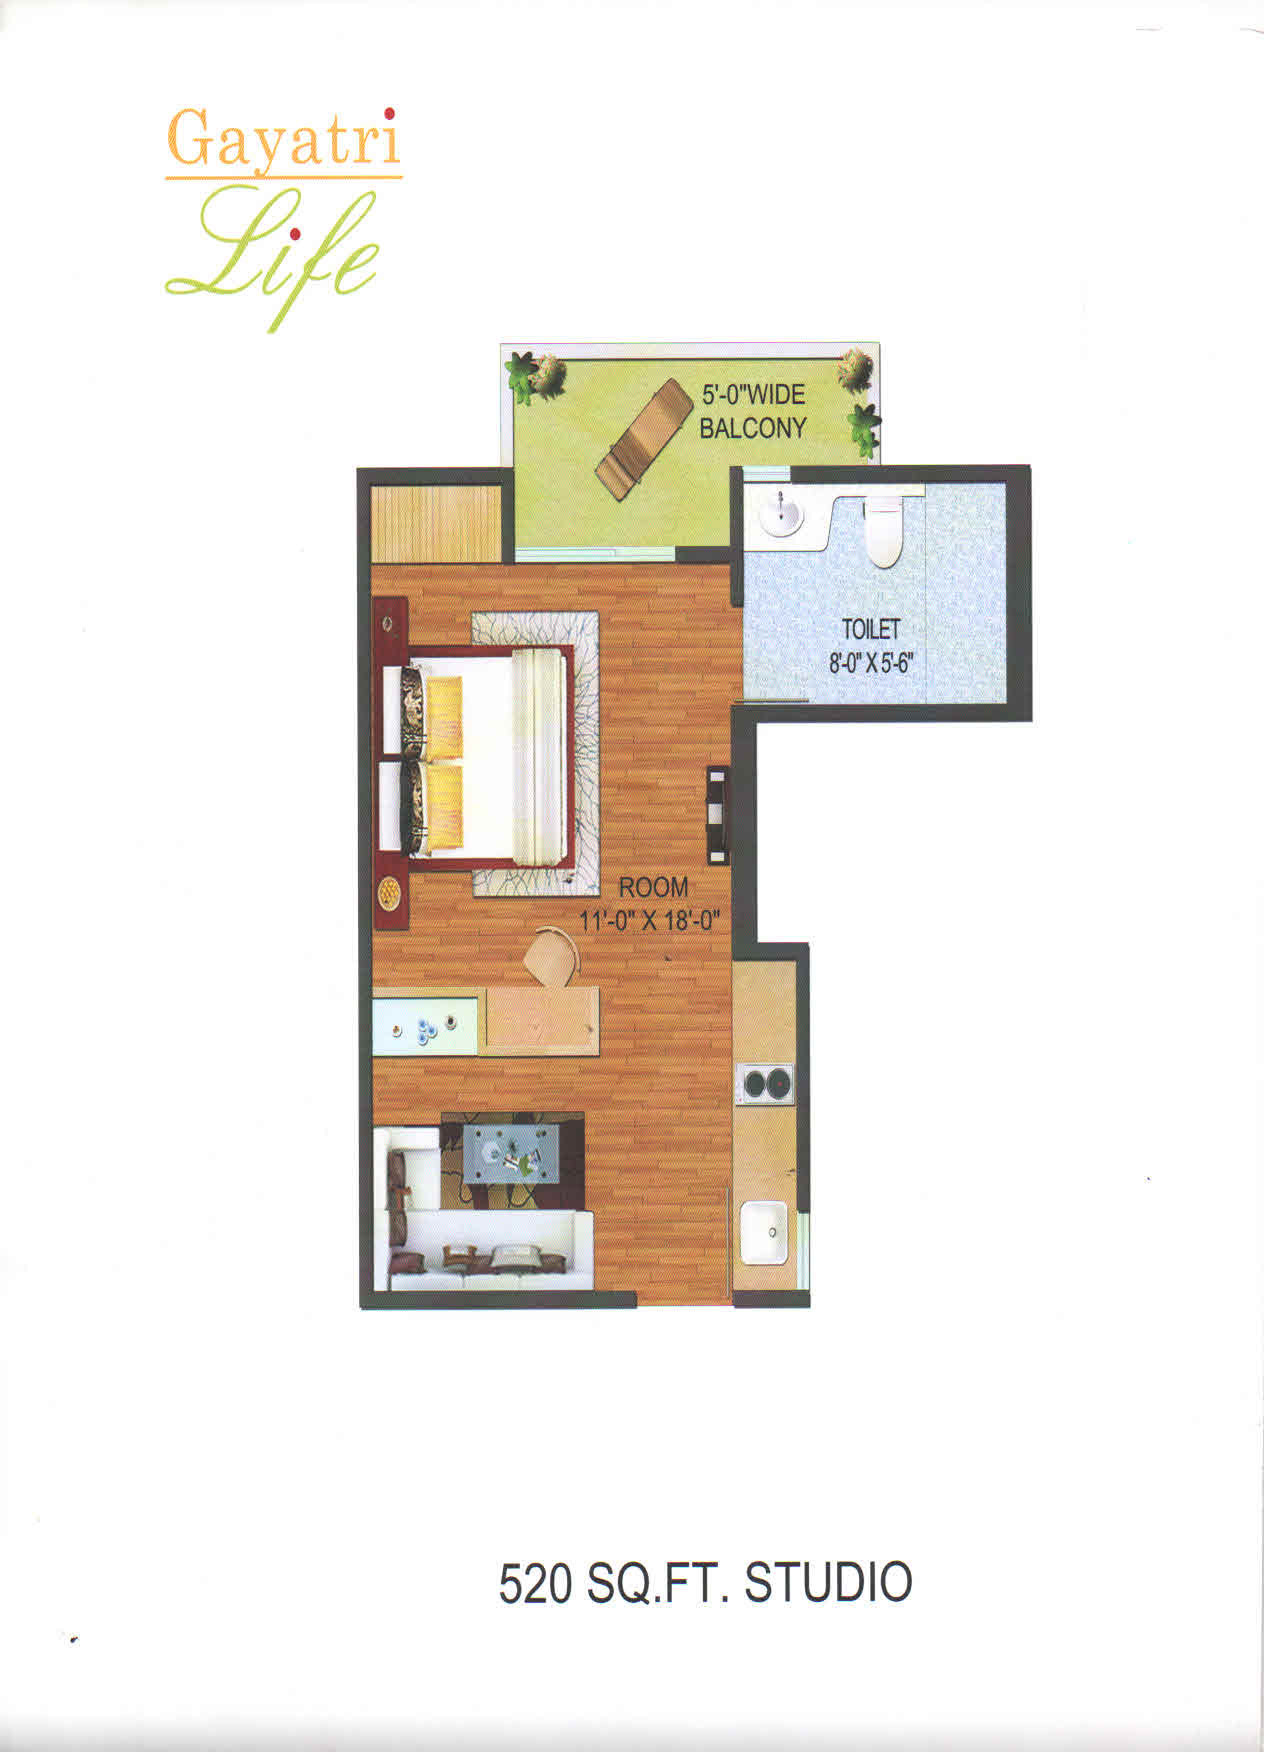 gayatri life floor plan1